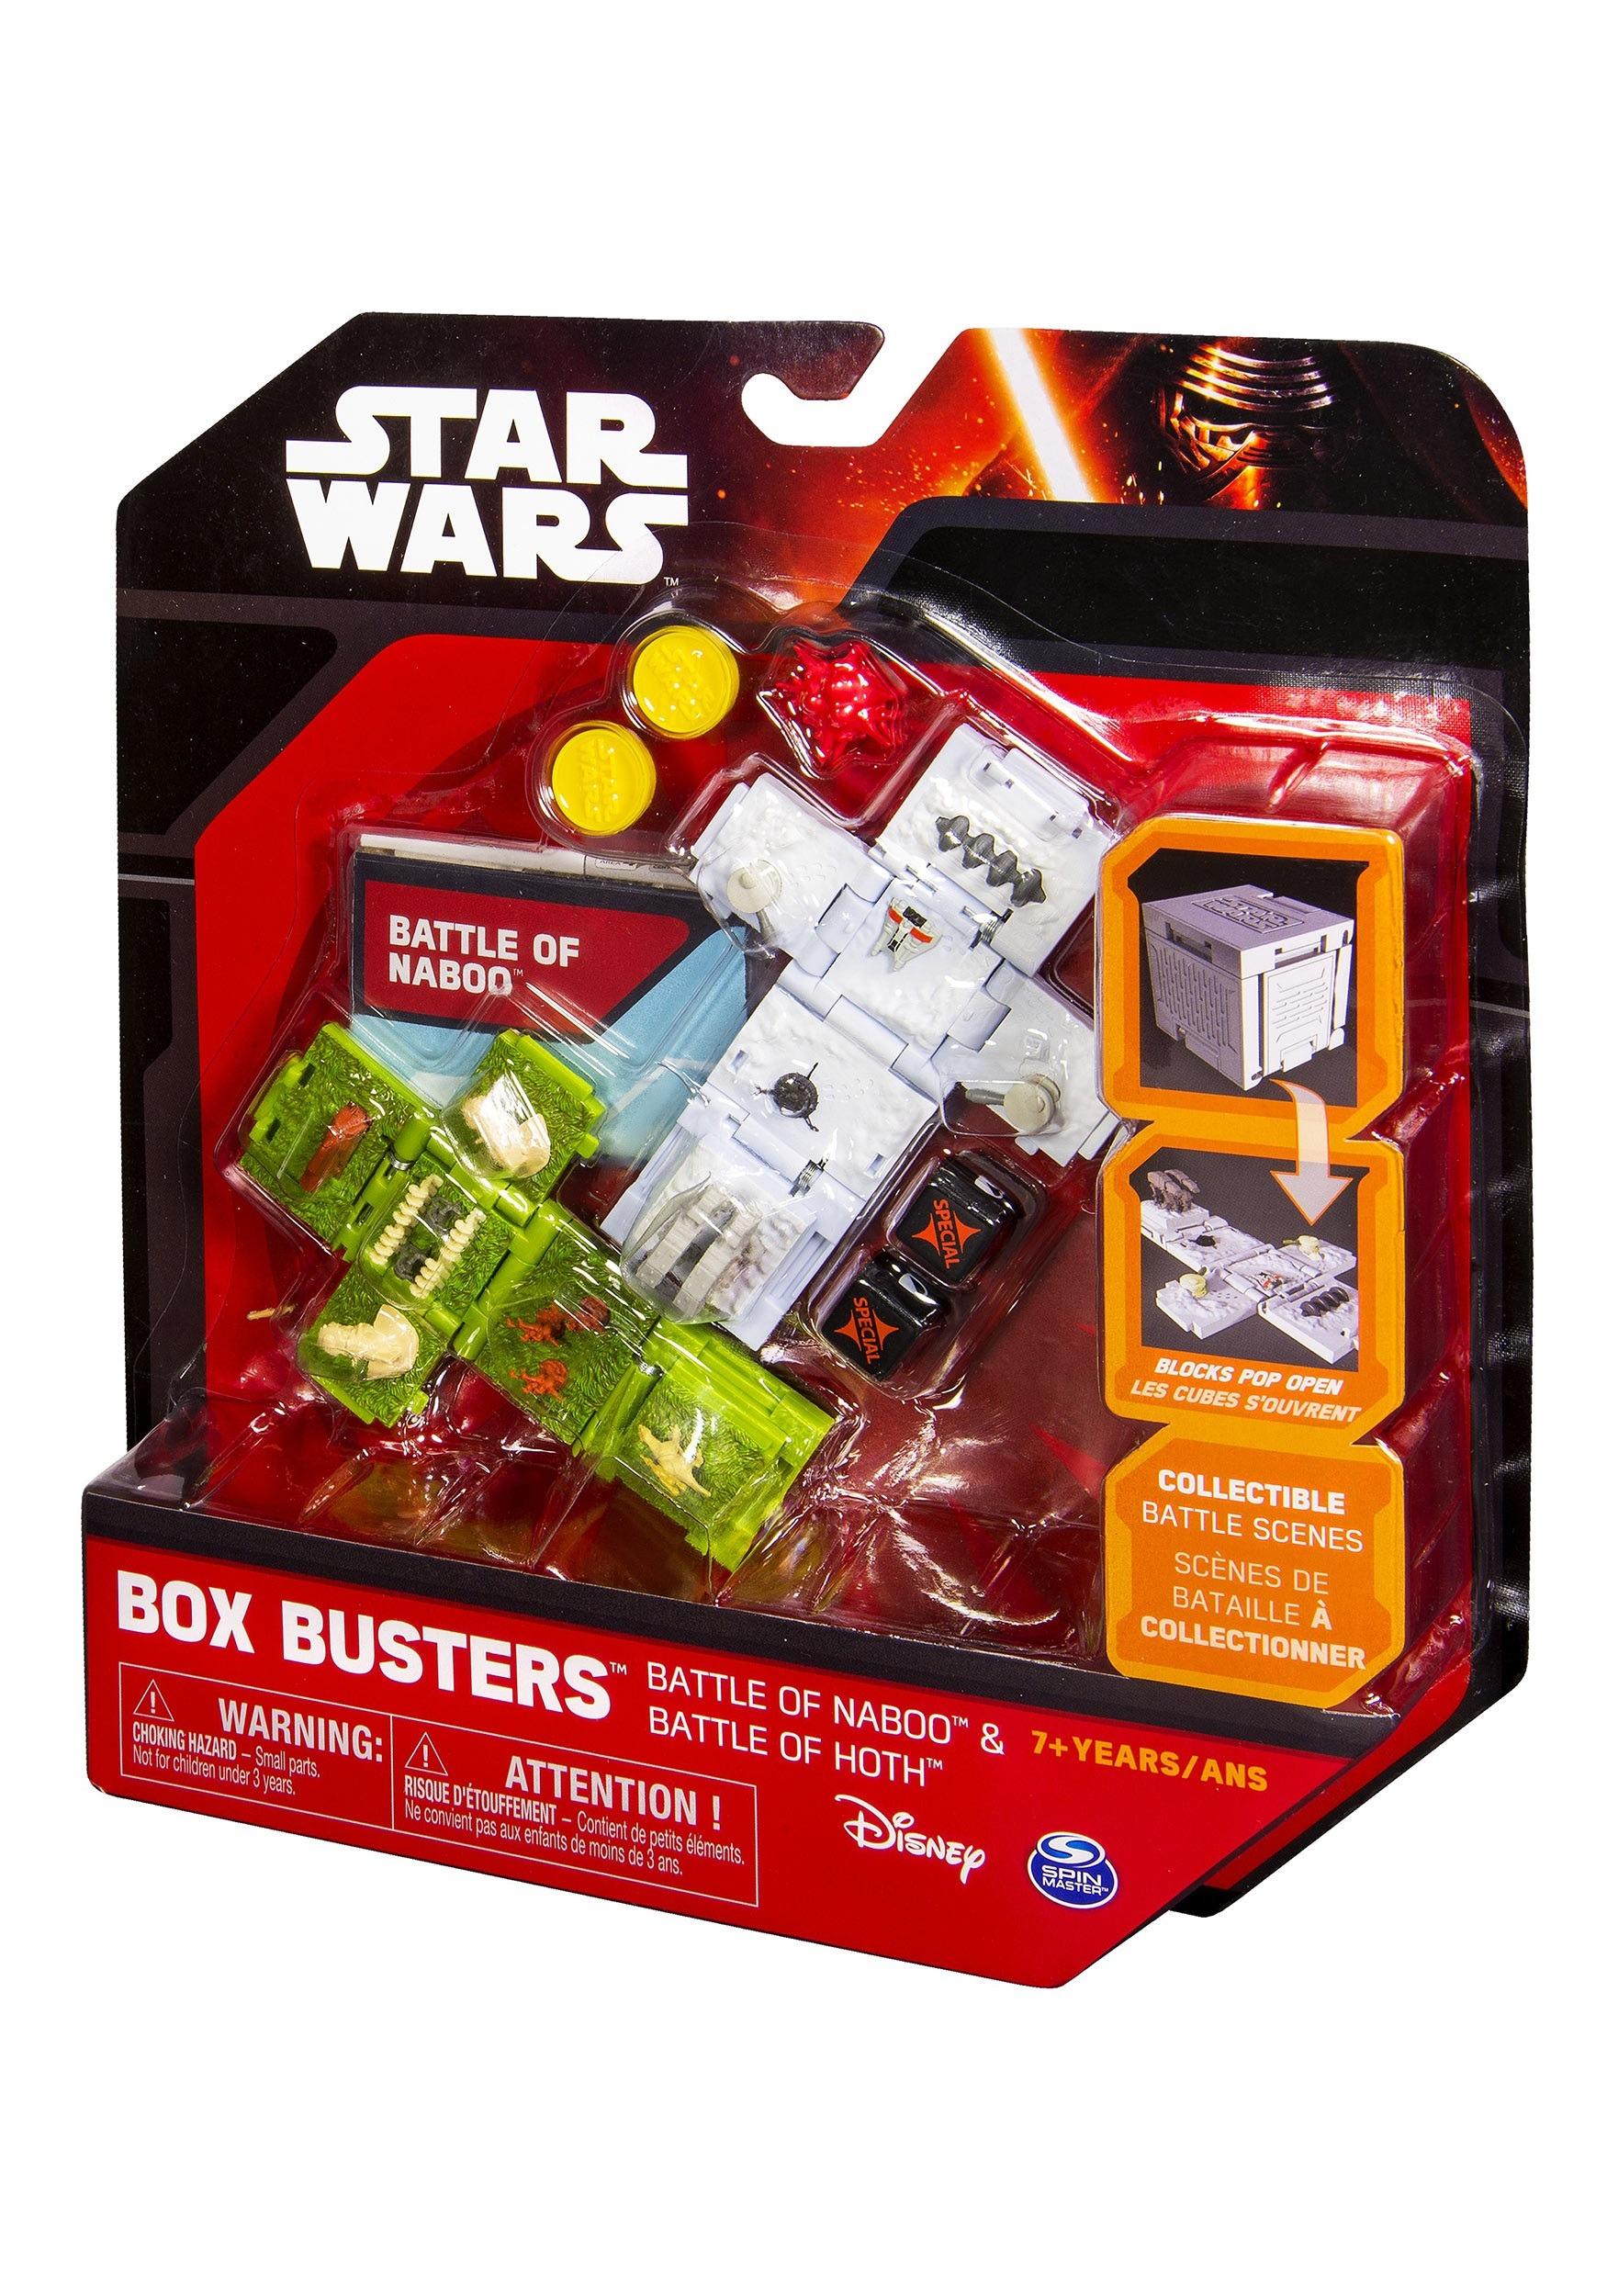 Star Wars Battle of Naboo & Battle of Hoth Box Buster Set SA20069301